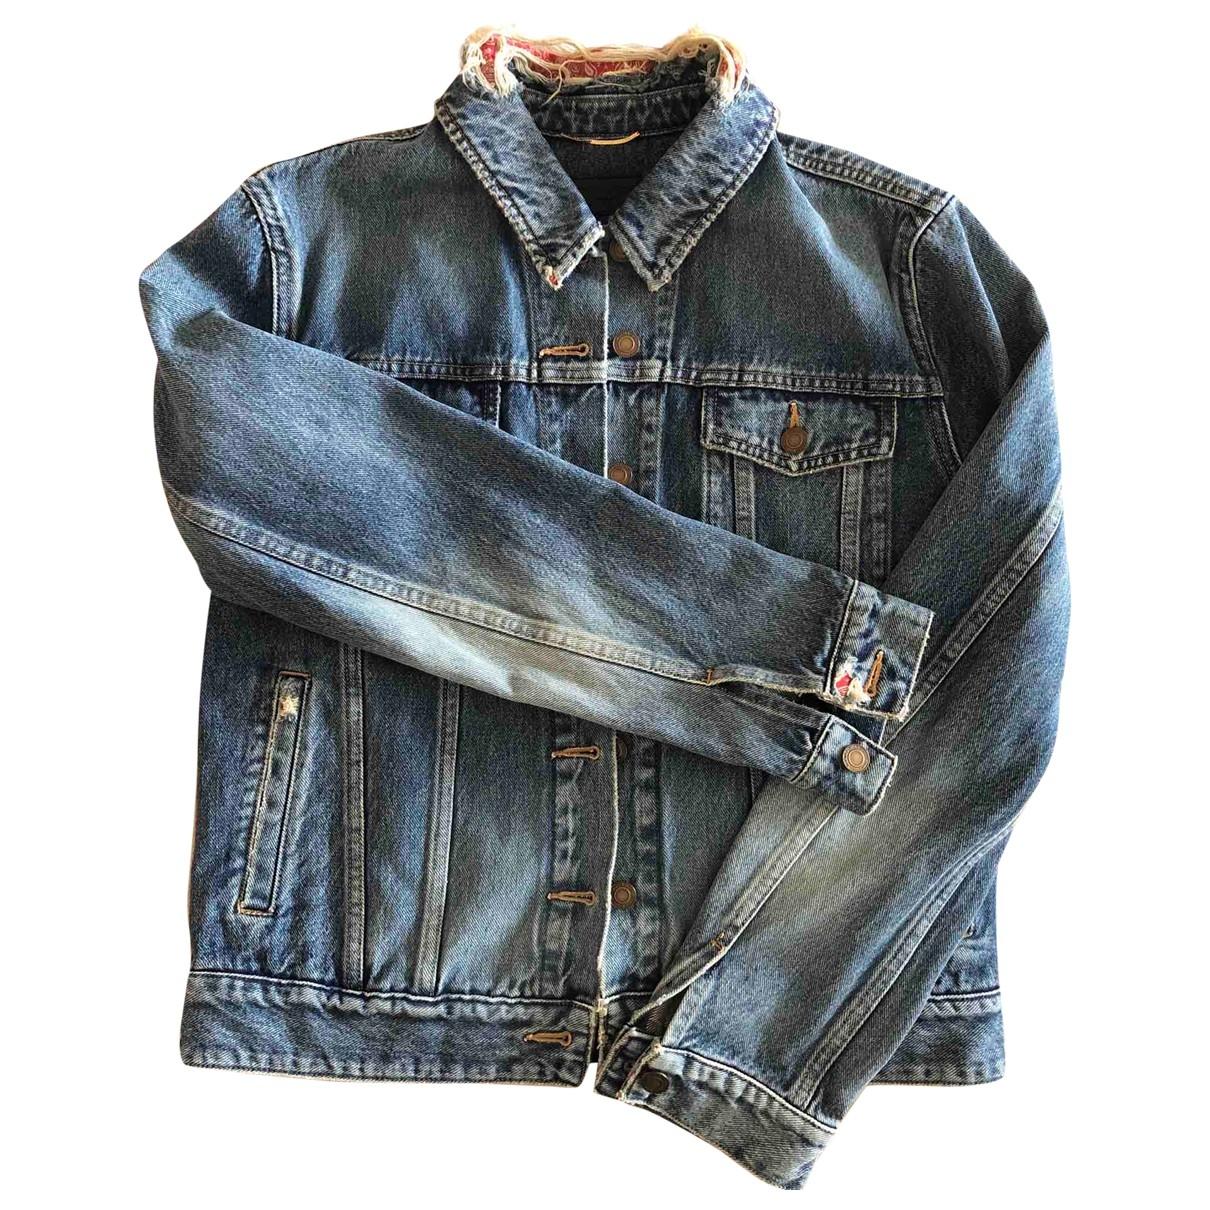 Saint Laurent \N Blue Denim - Jeans jacket for Women S International